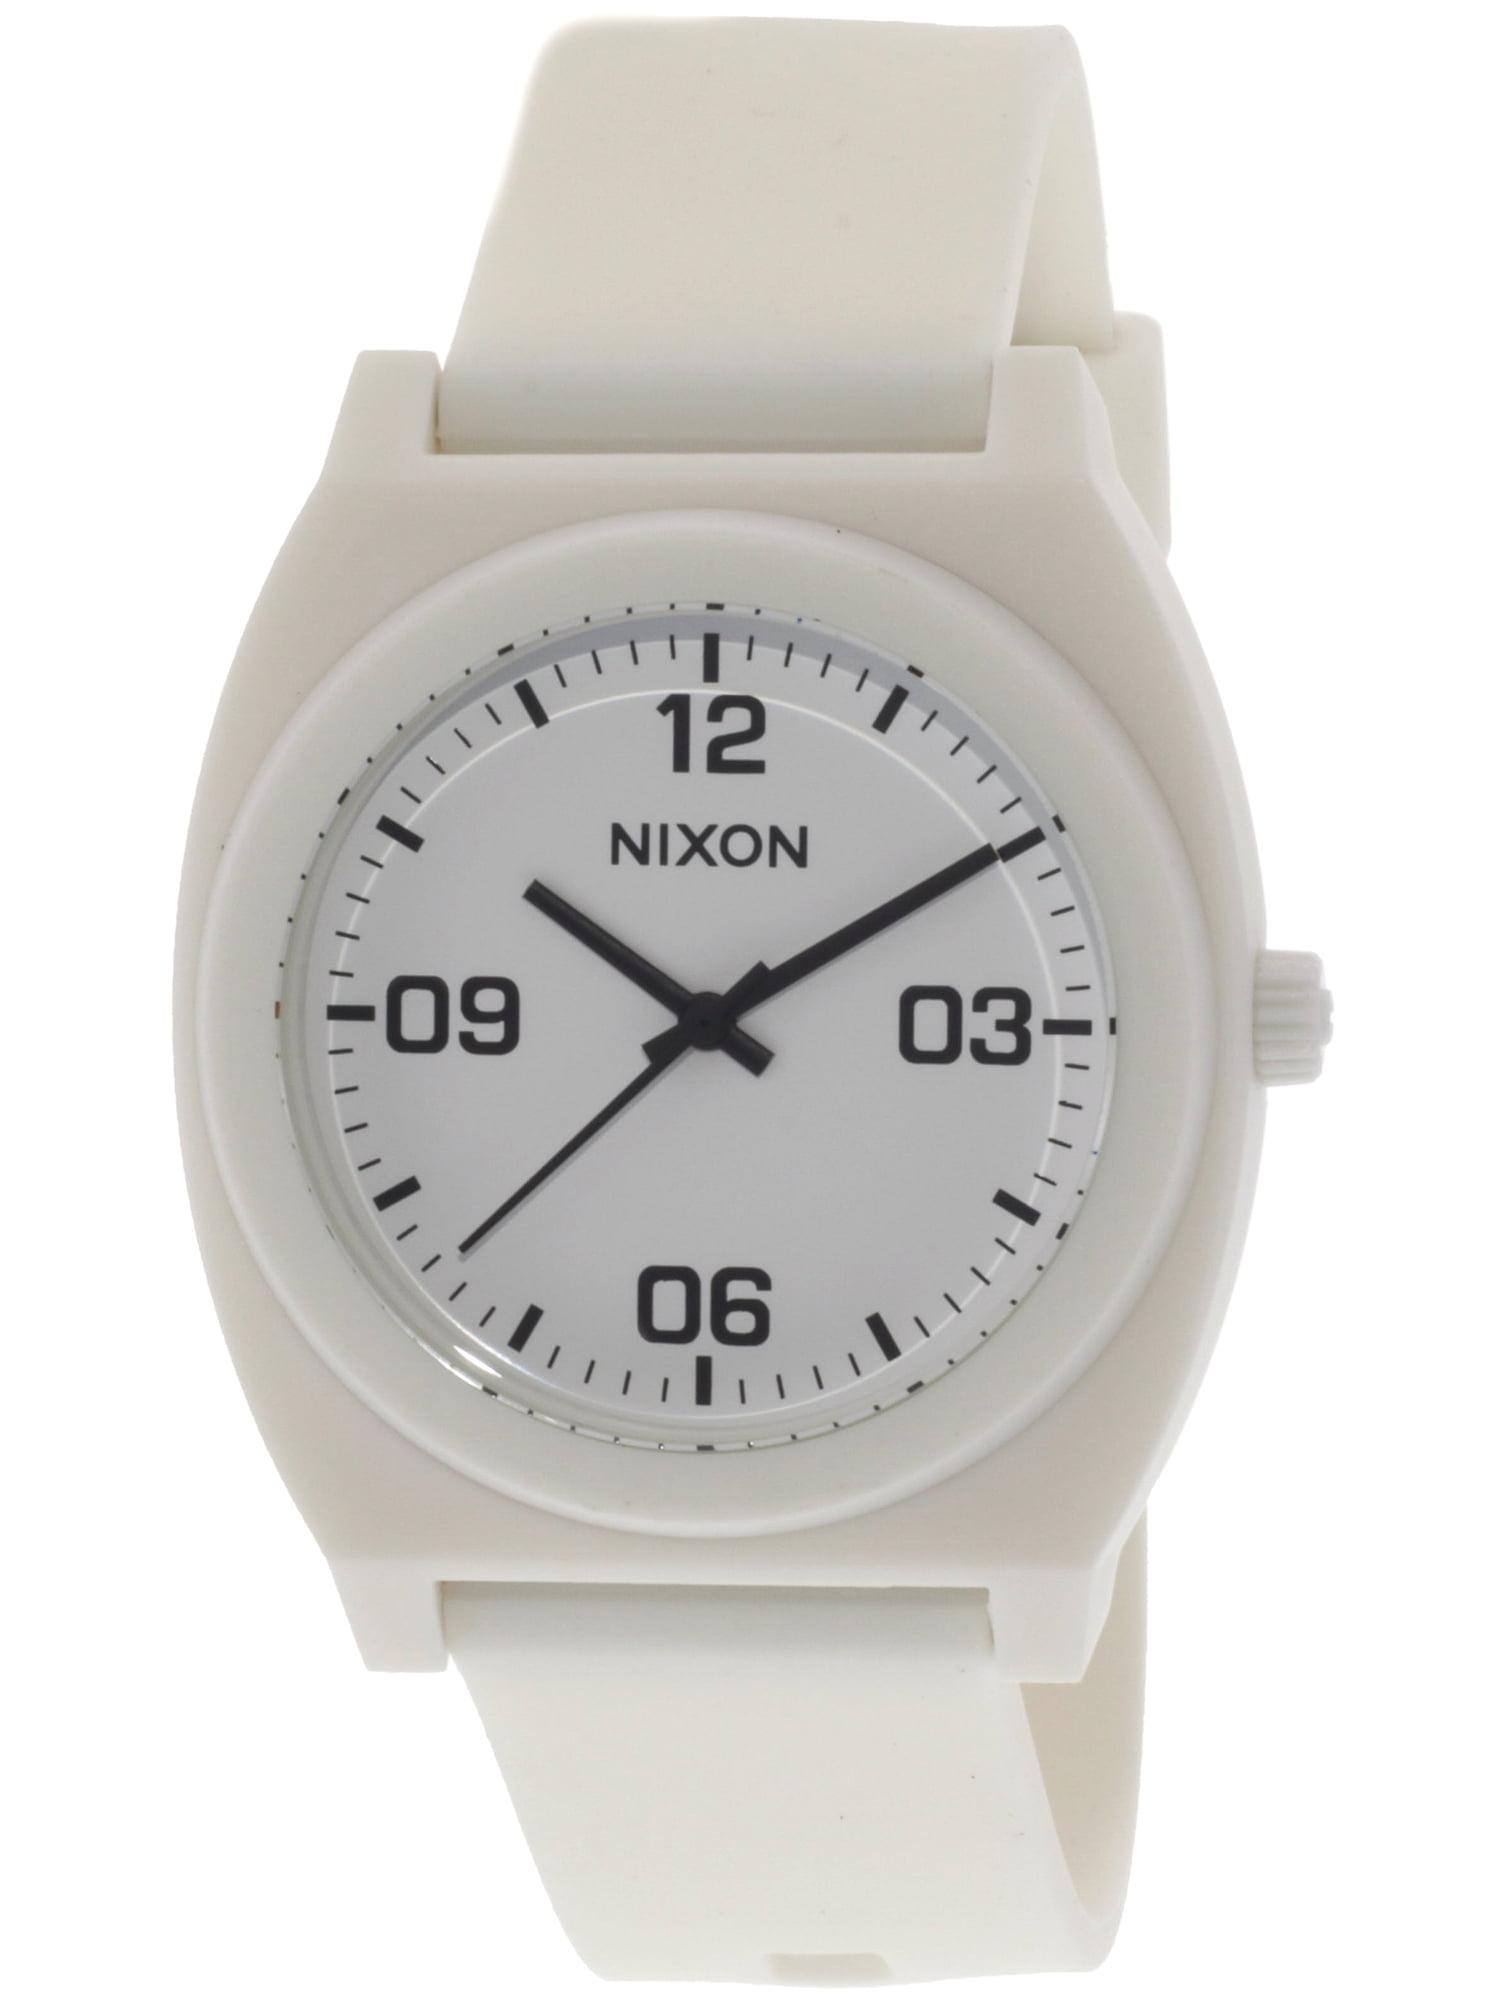 A12483009 White Resin Japanese Quartz Fashion Watch